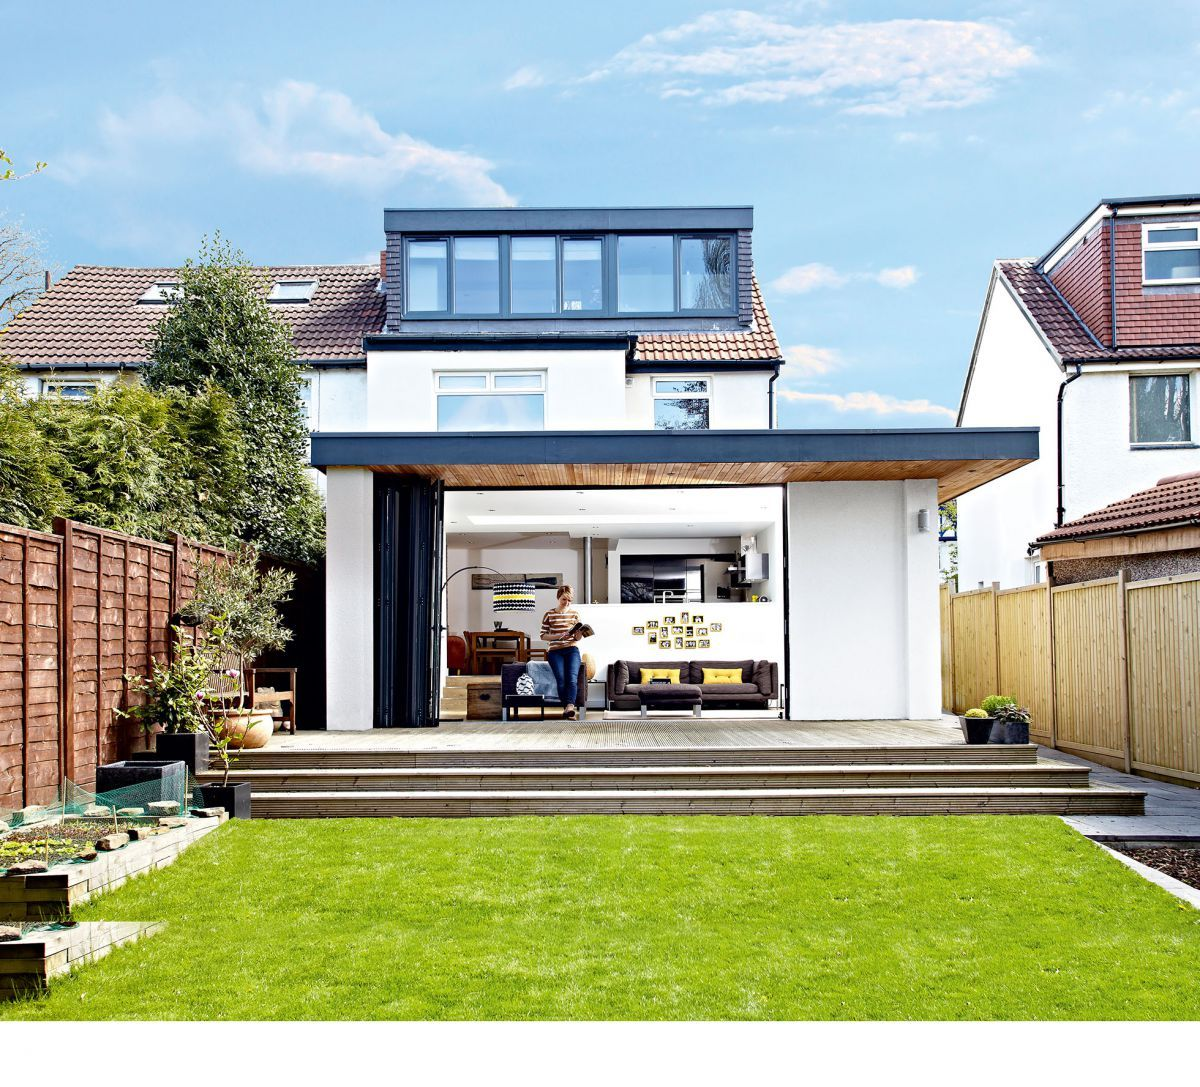 Kitchen Extensions The Lowdown Dormer Loft Conversion Flat Roof Extension Loft Conversion